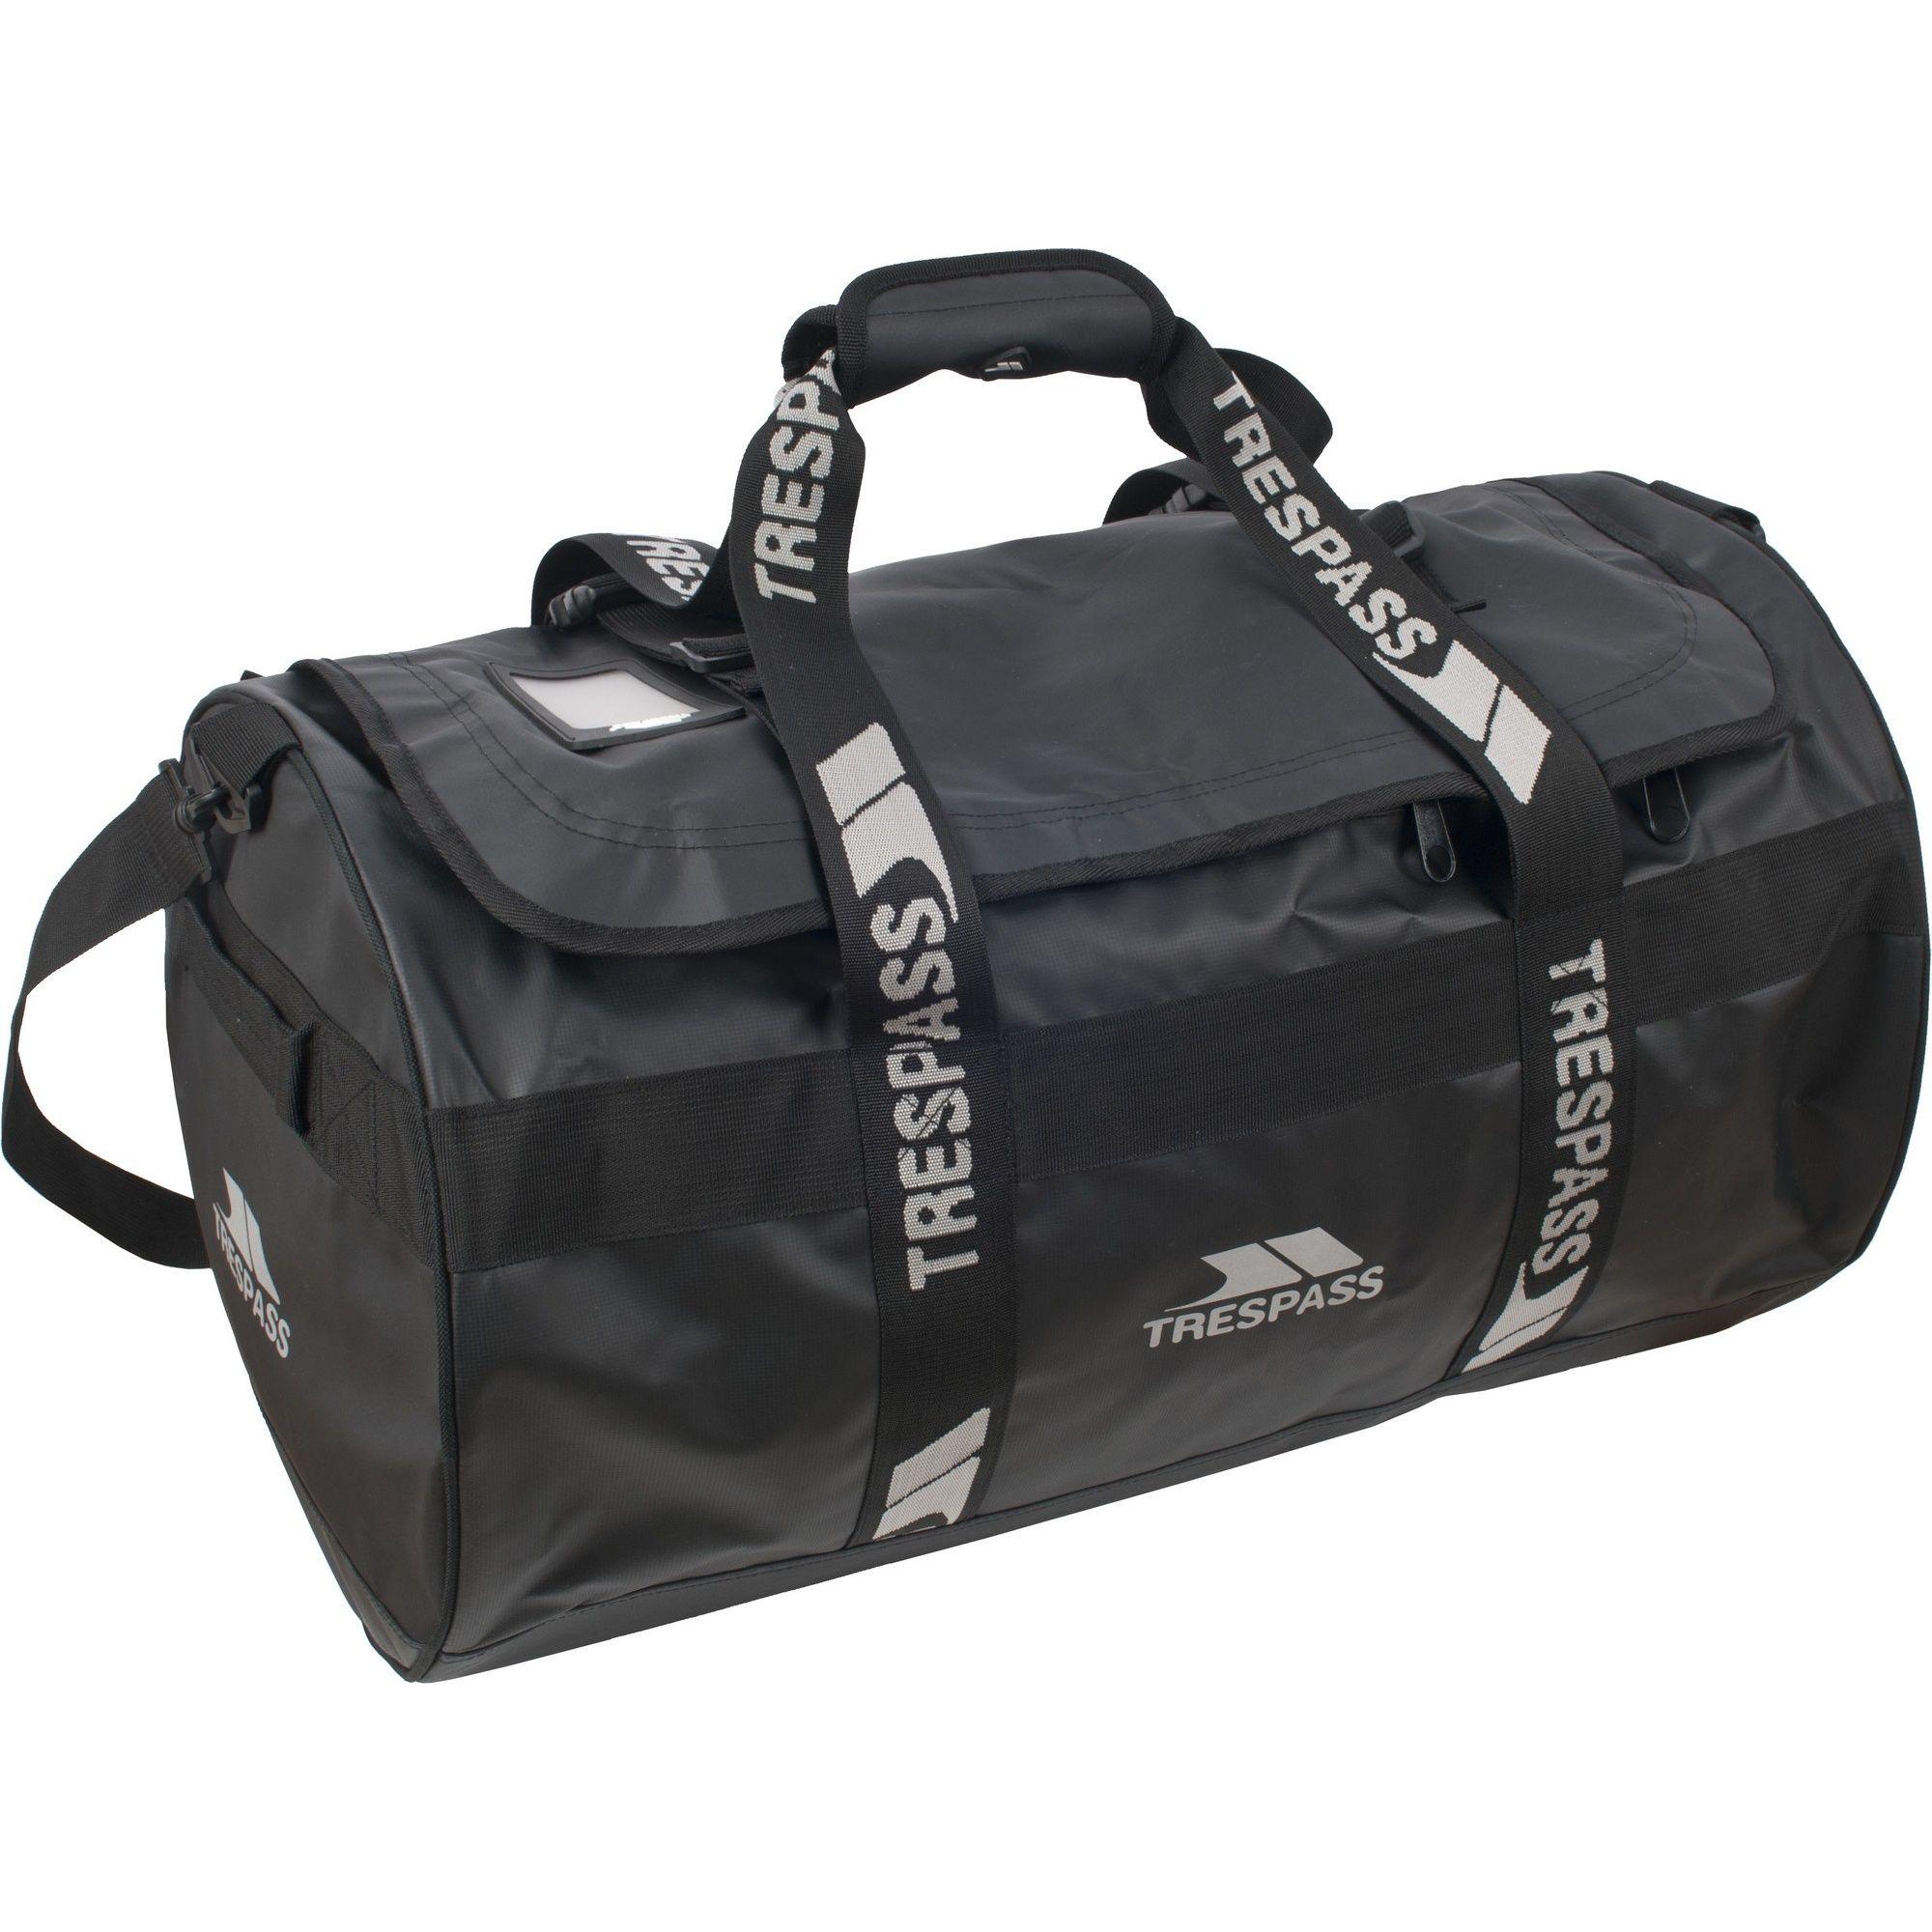 Trespass Blackfriar Waterproof Holdall Bag (60 Litres)